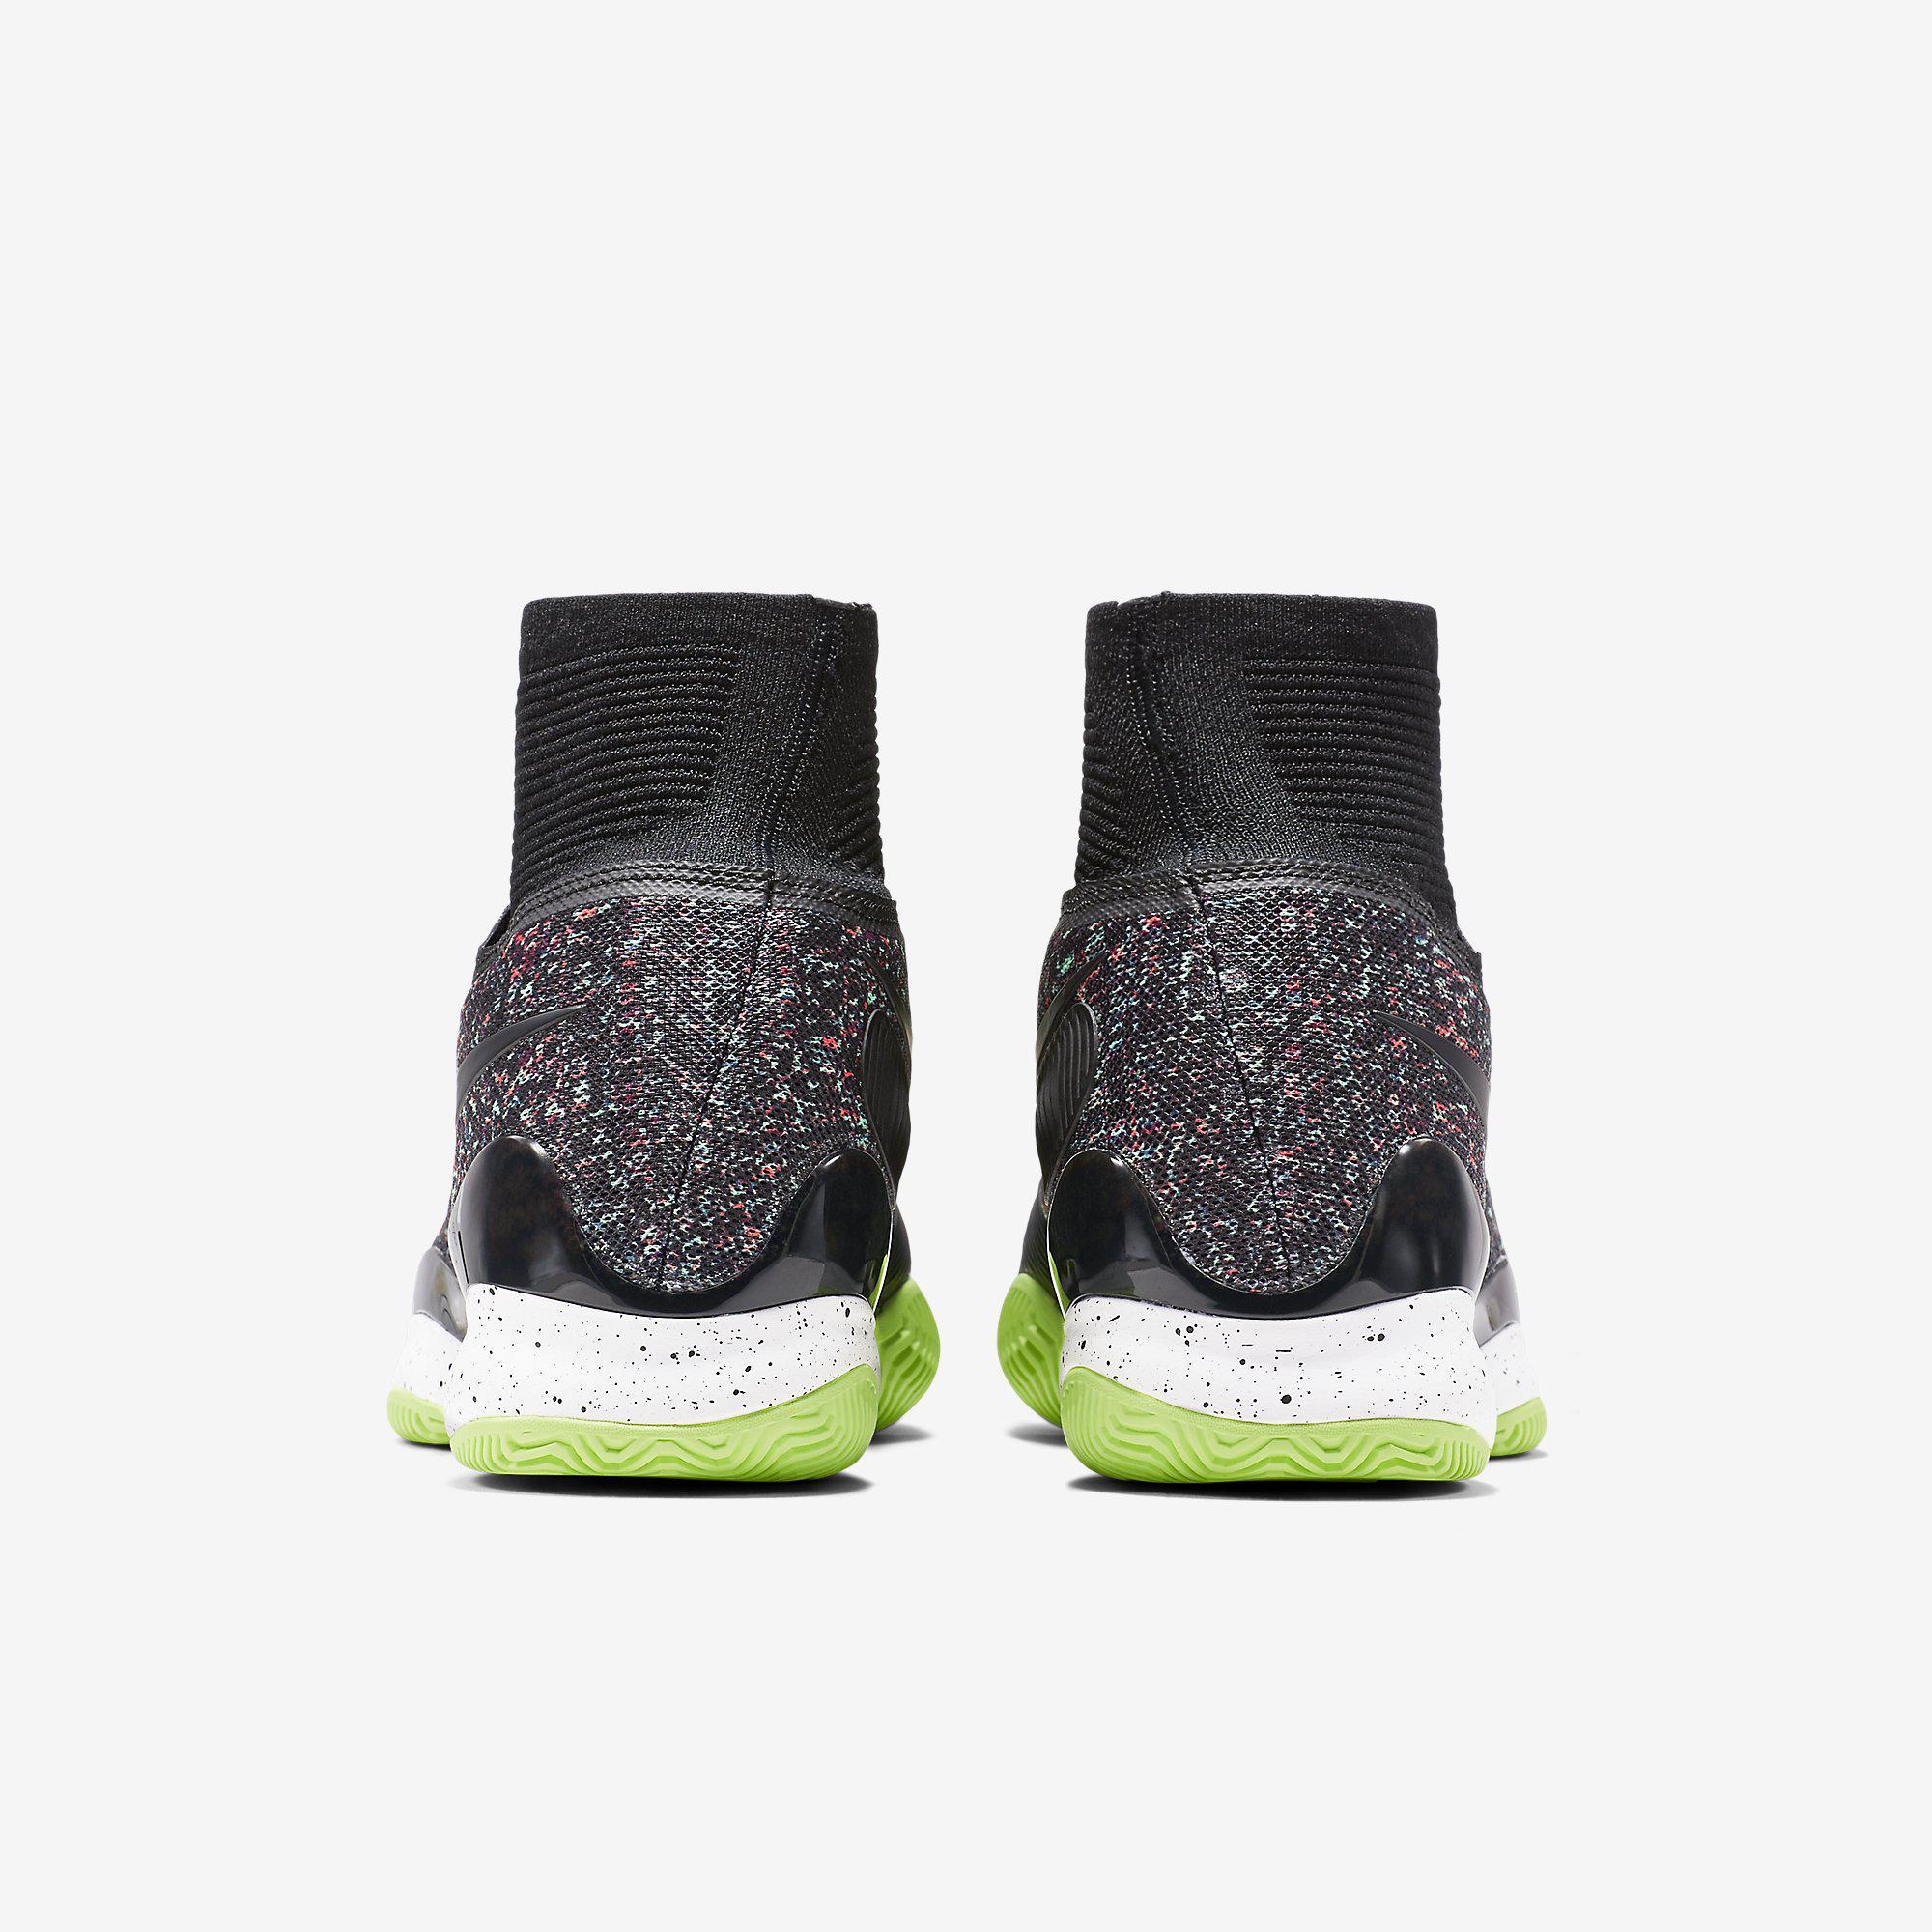 ac94cbfa611d2 Nike Mens Air Zoom Ultrafly Tennis Shoes - Multi-Colour [Limited Edition]